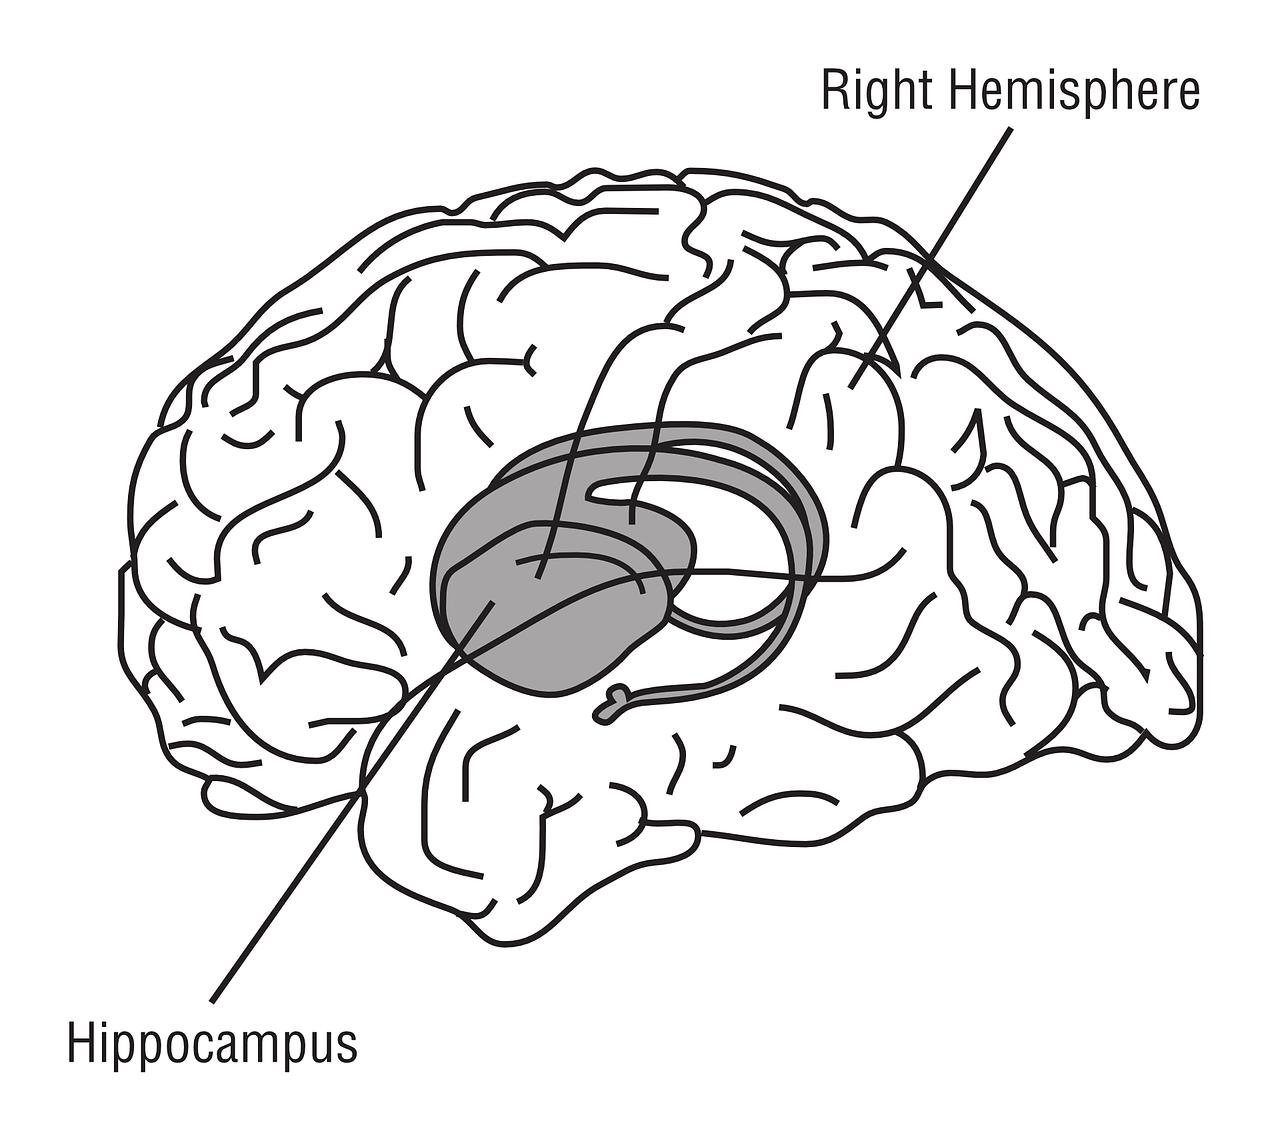 Hippocampus,brain,anatomy,medicine,free vector graphics - free photo ...